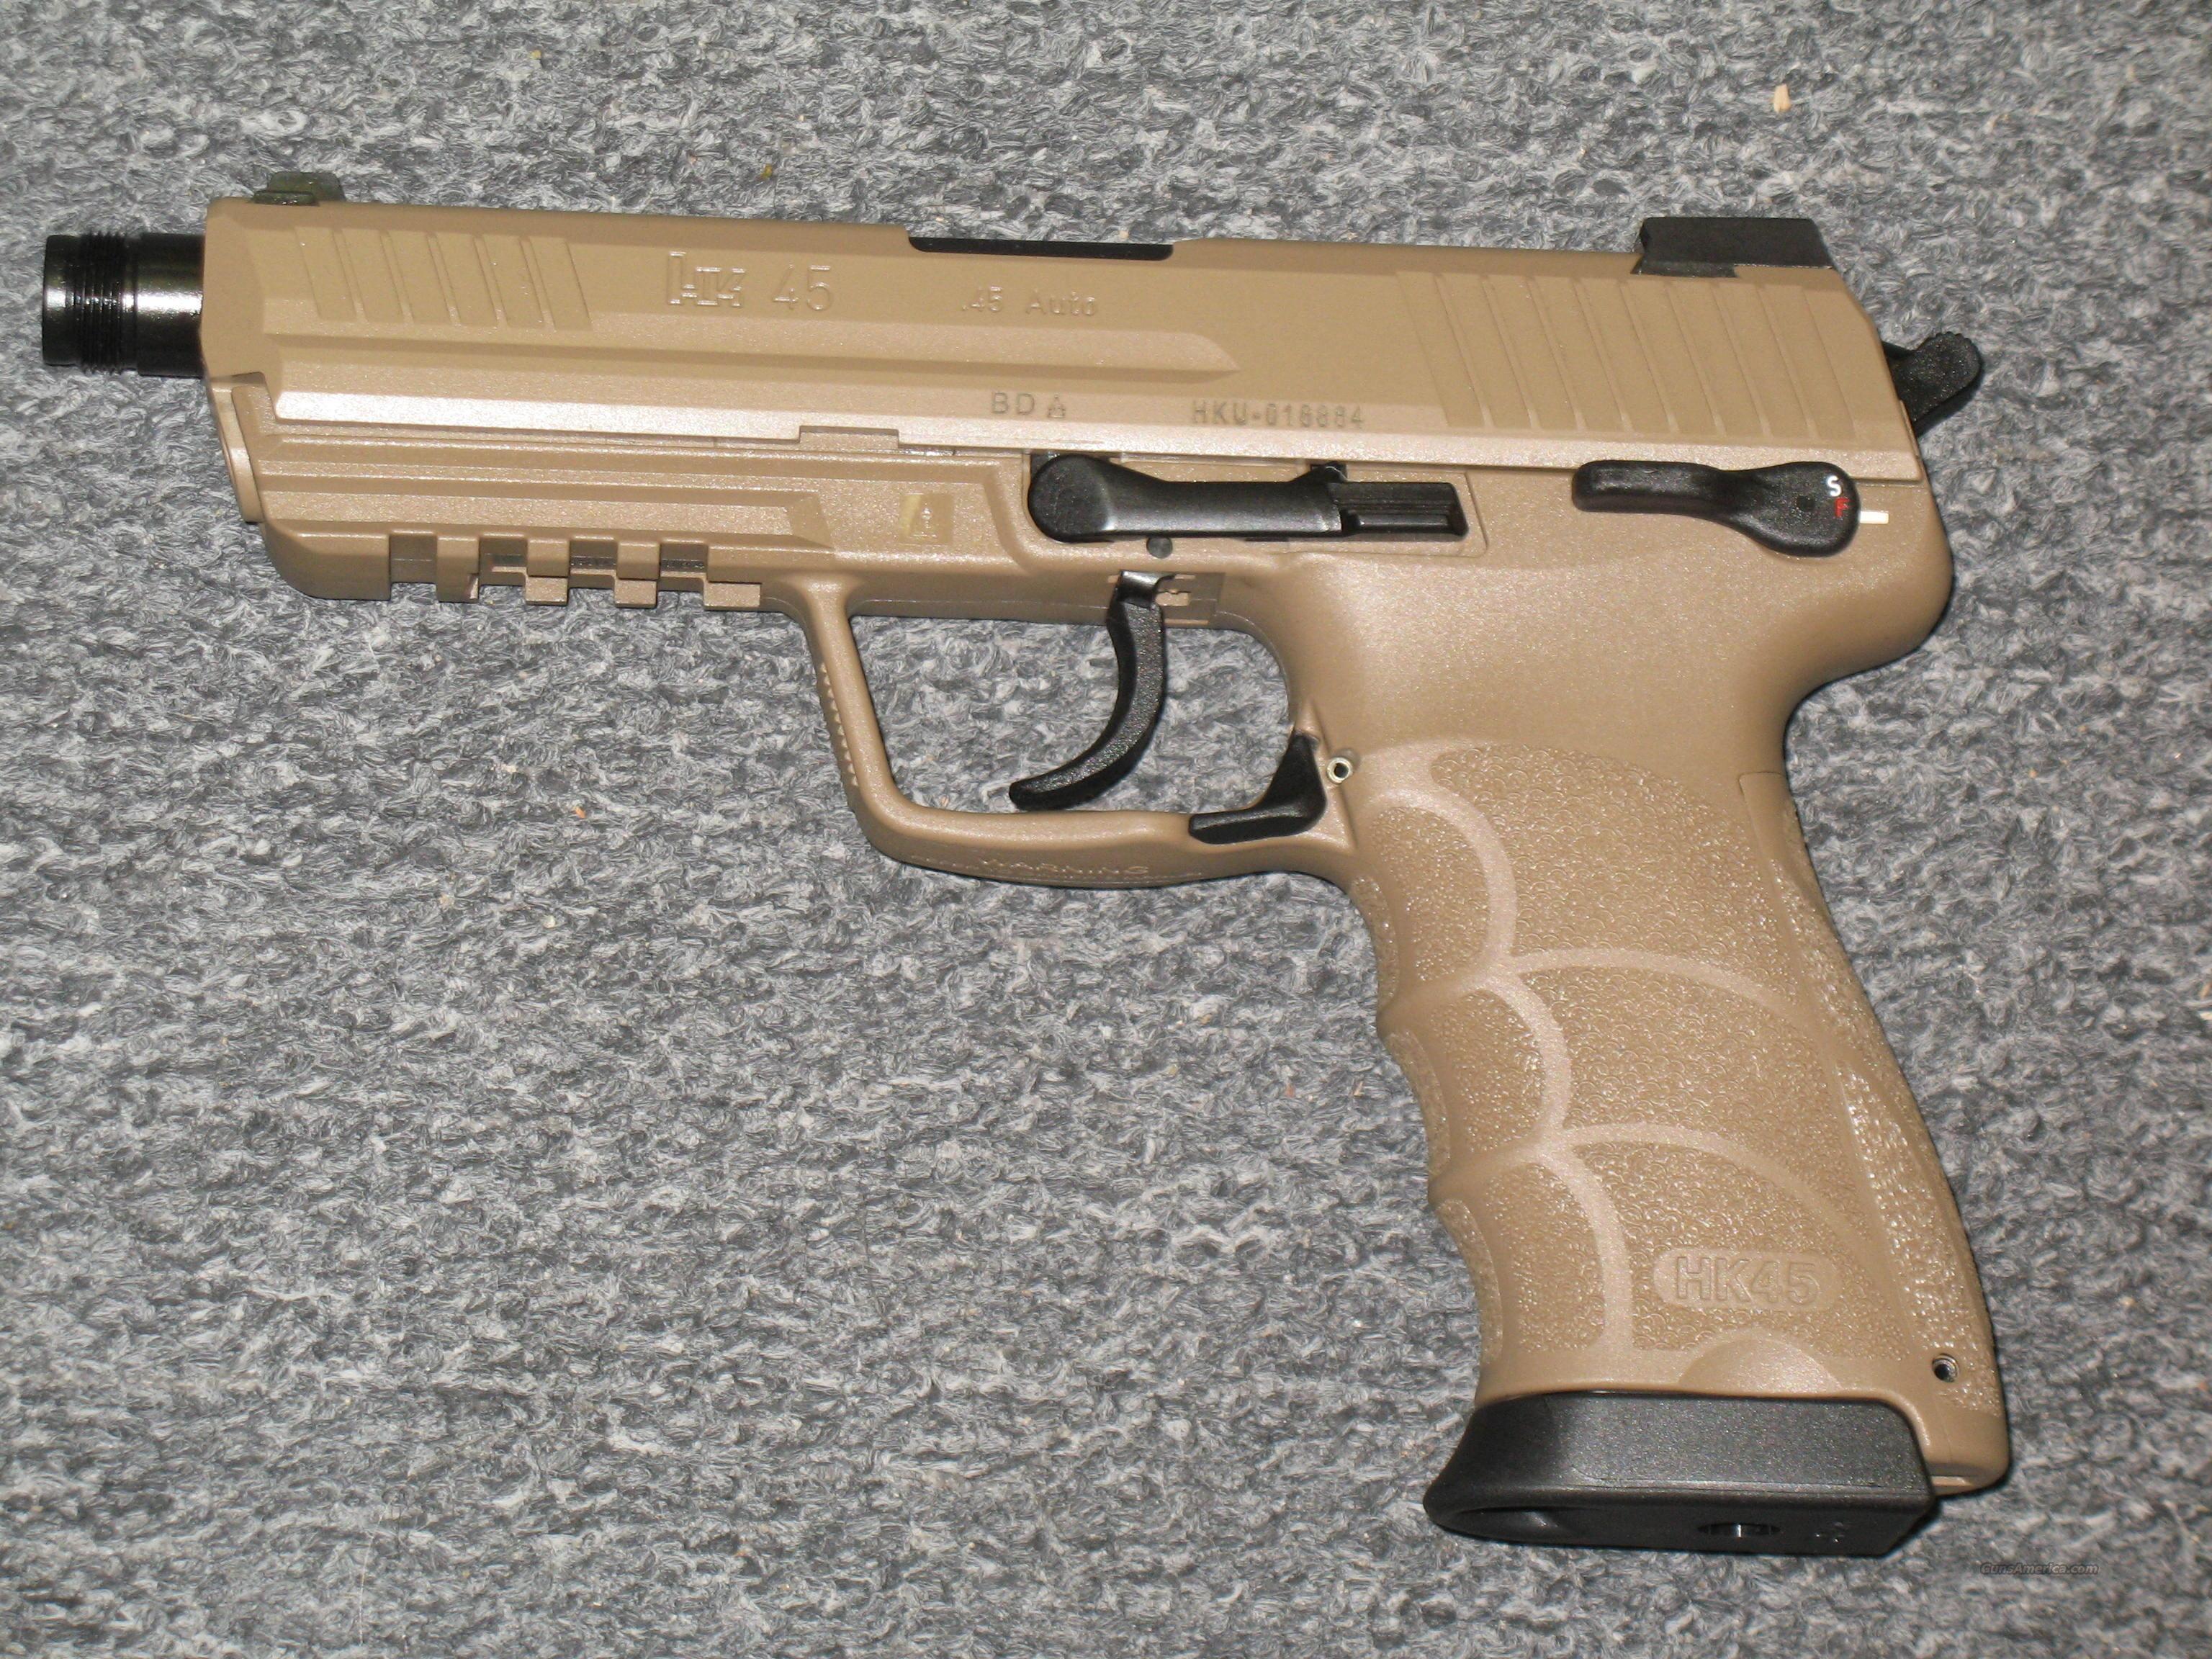 HK45 Tactical w/Flat Dark Earth finish